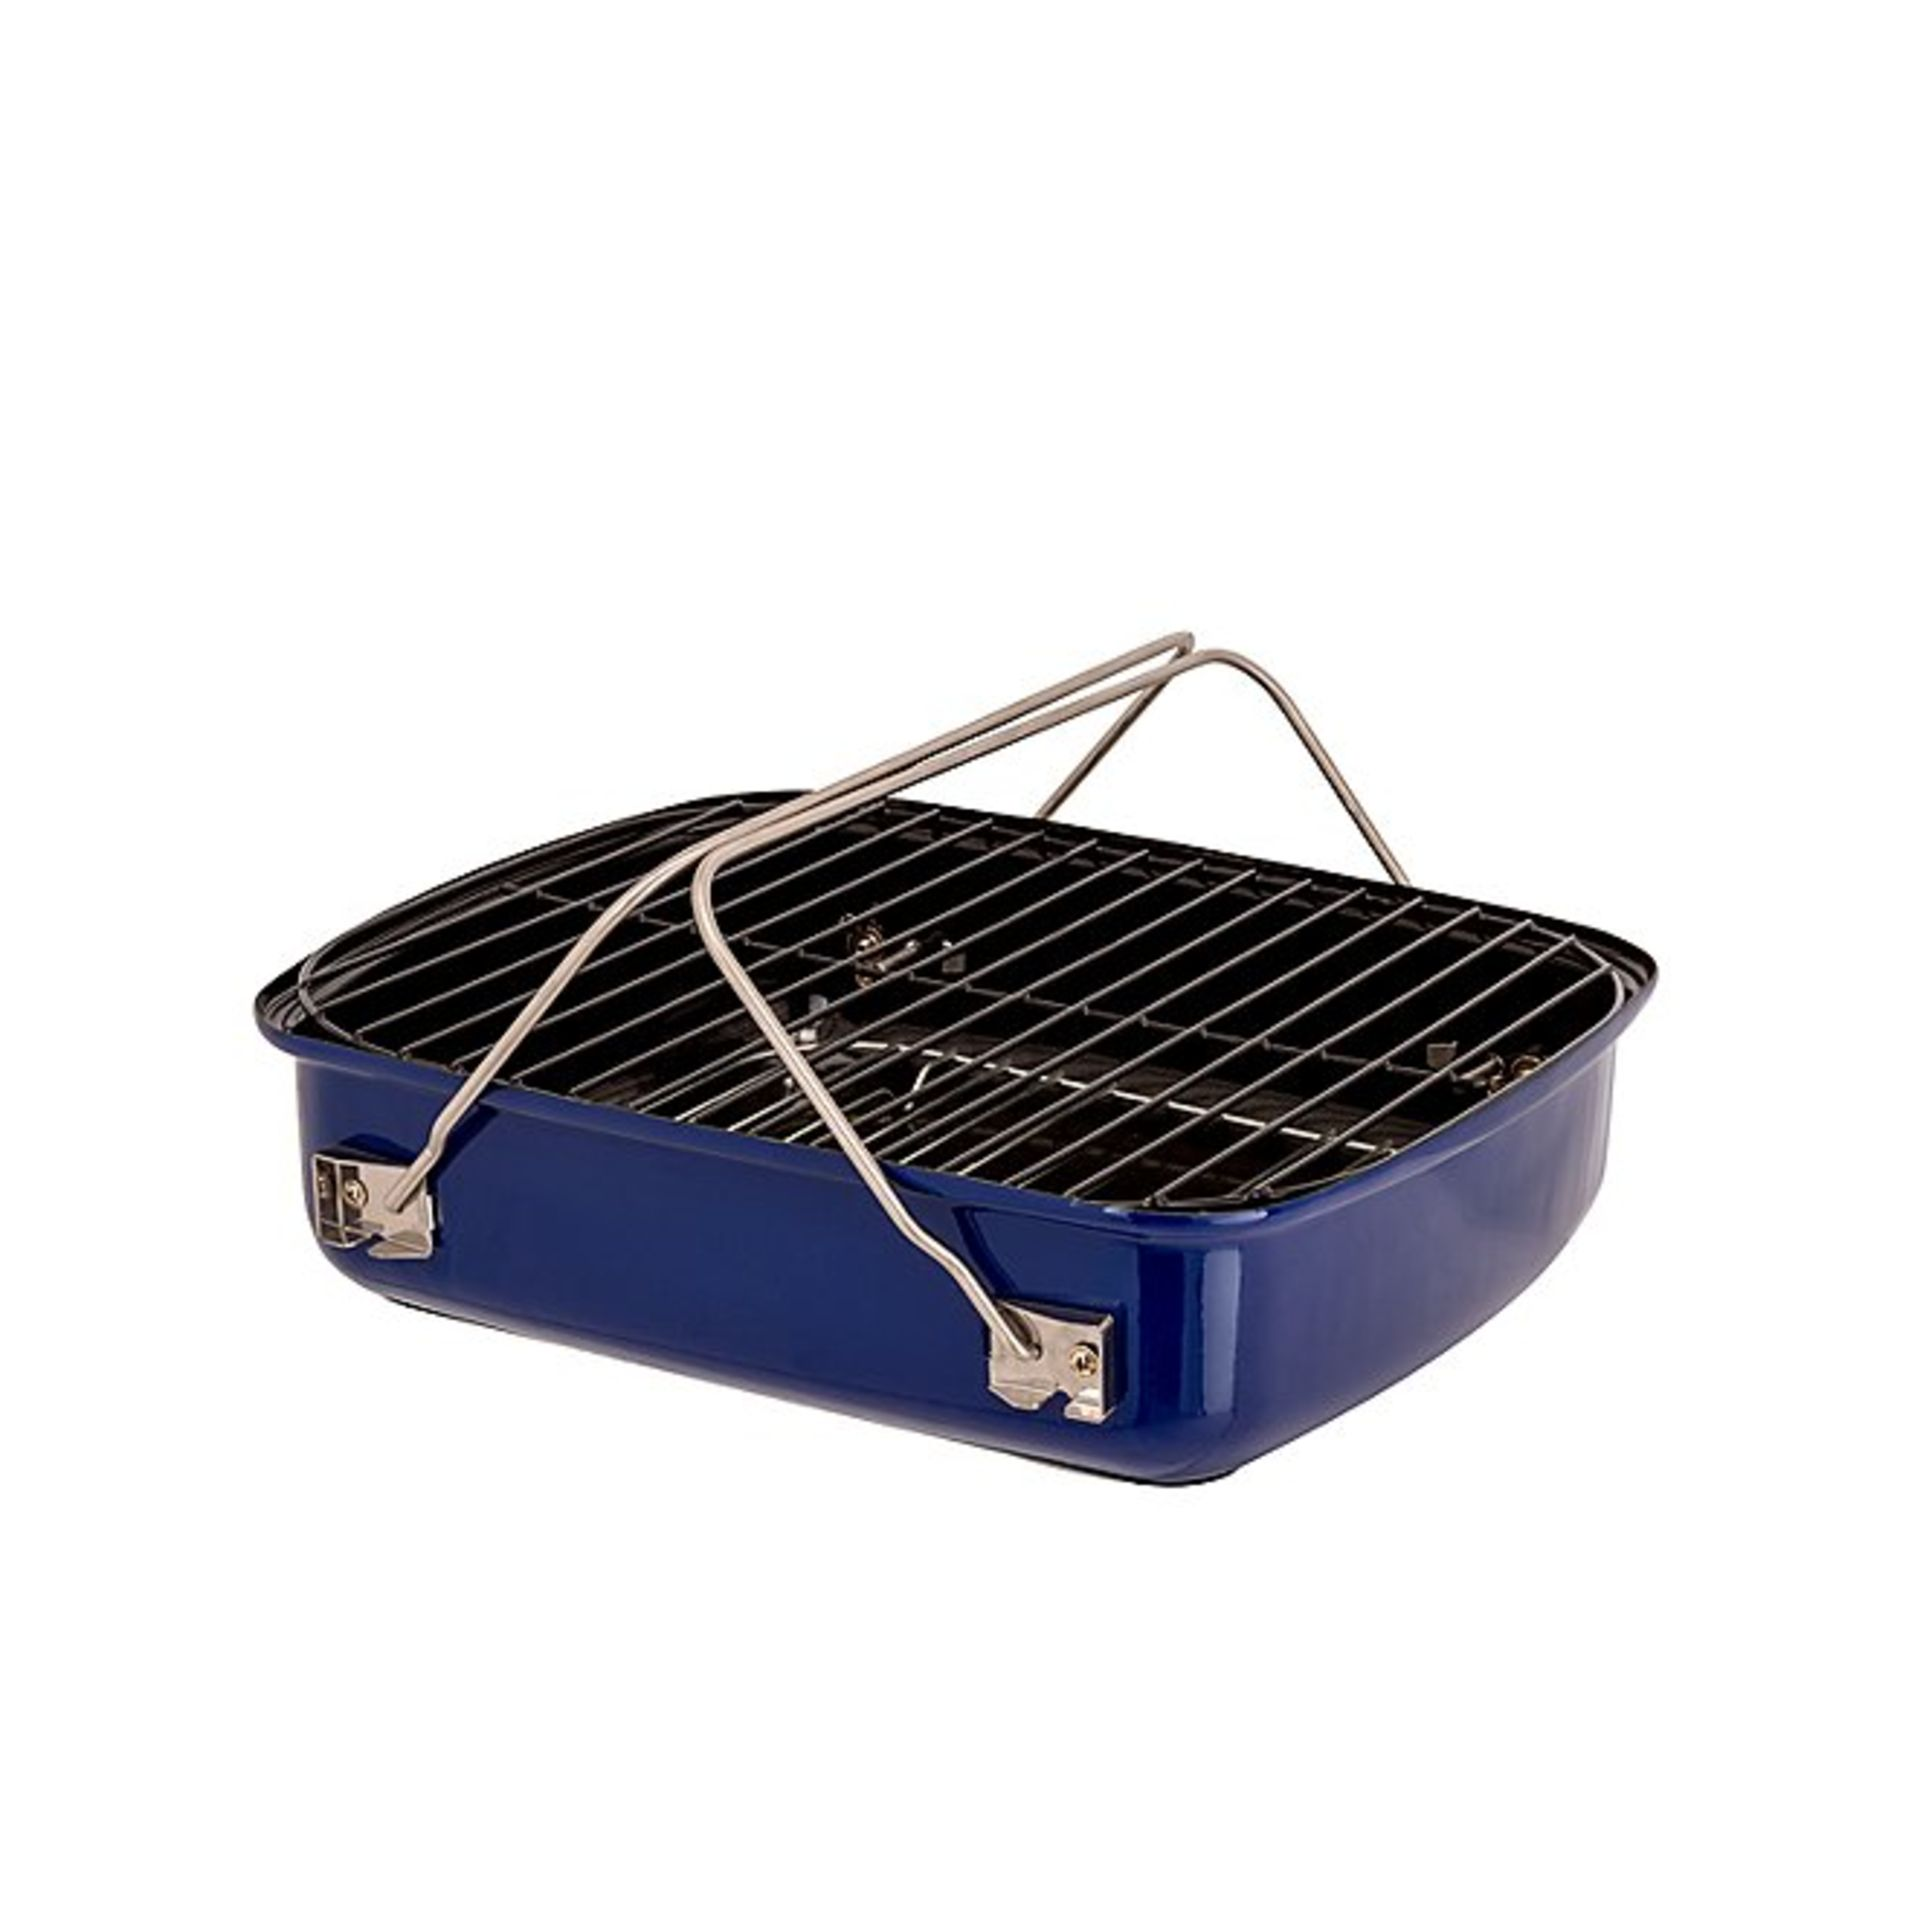 (3F) 8x Expert Grill BBQ Items. 3X 40cm Round Trolly BBQ. 1x The Big Portable Grill. 1x Portable Ga - Image 3 of 4